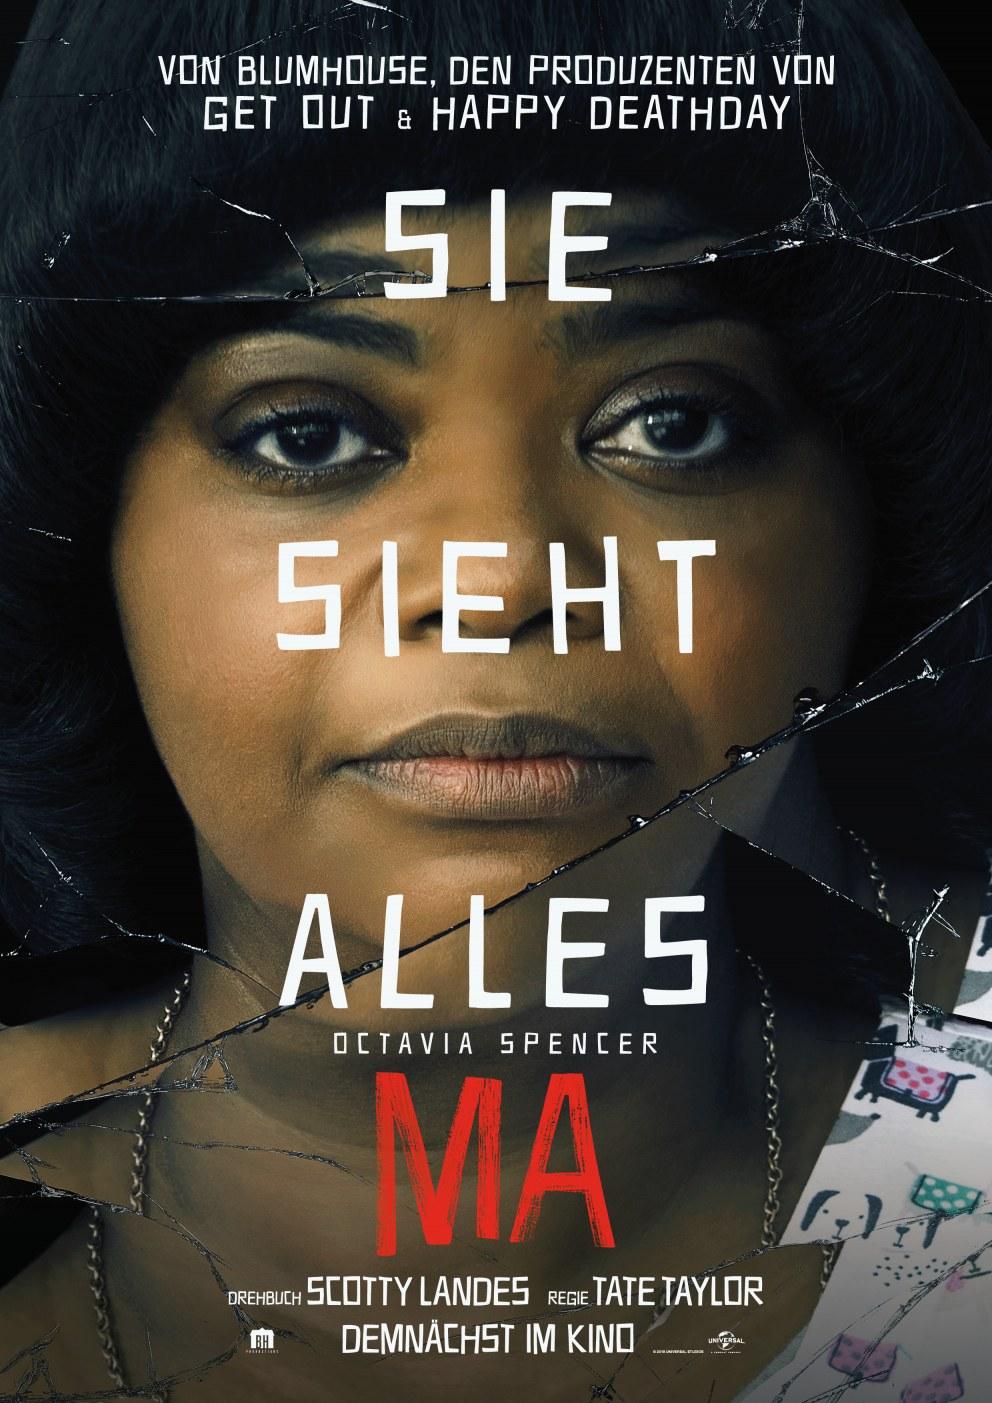 Kino Neumünster Preise